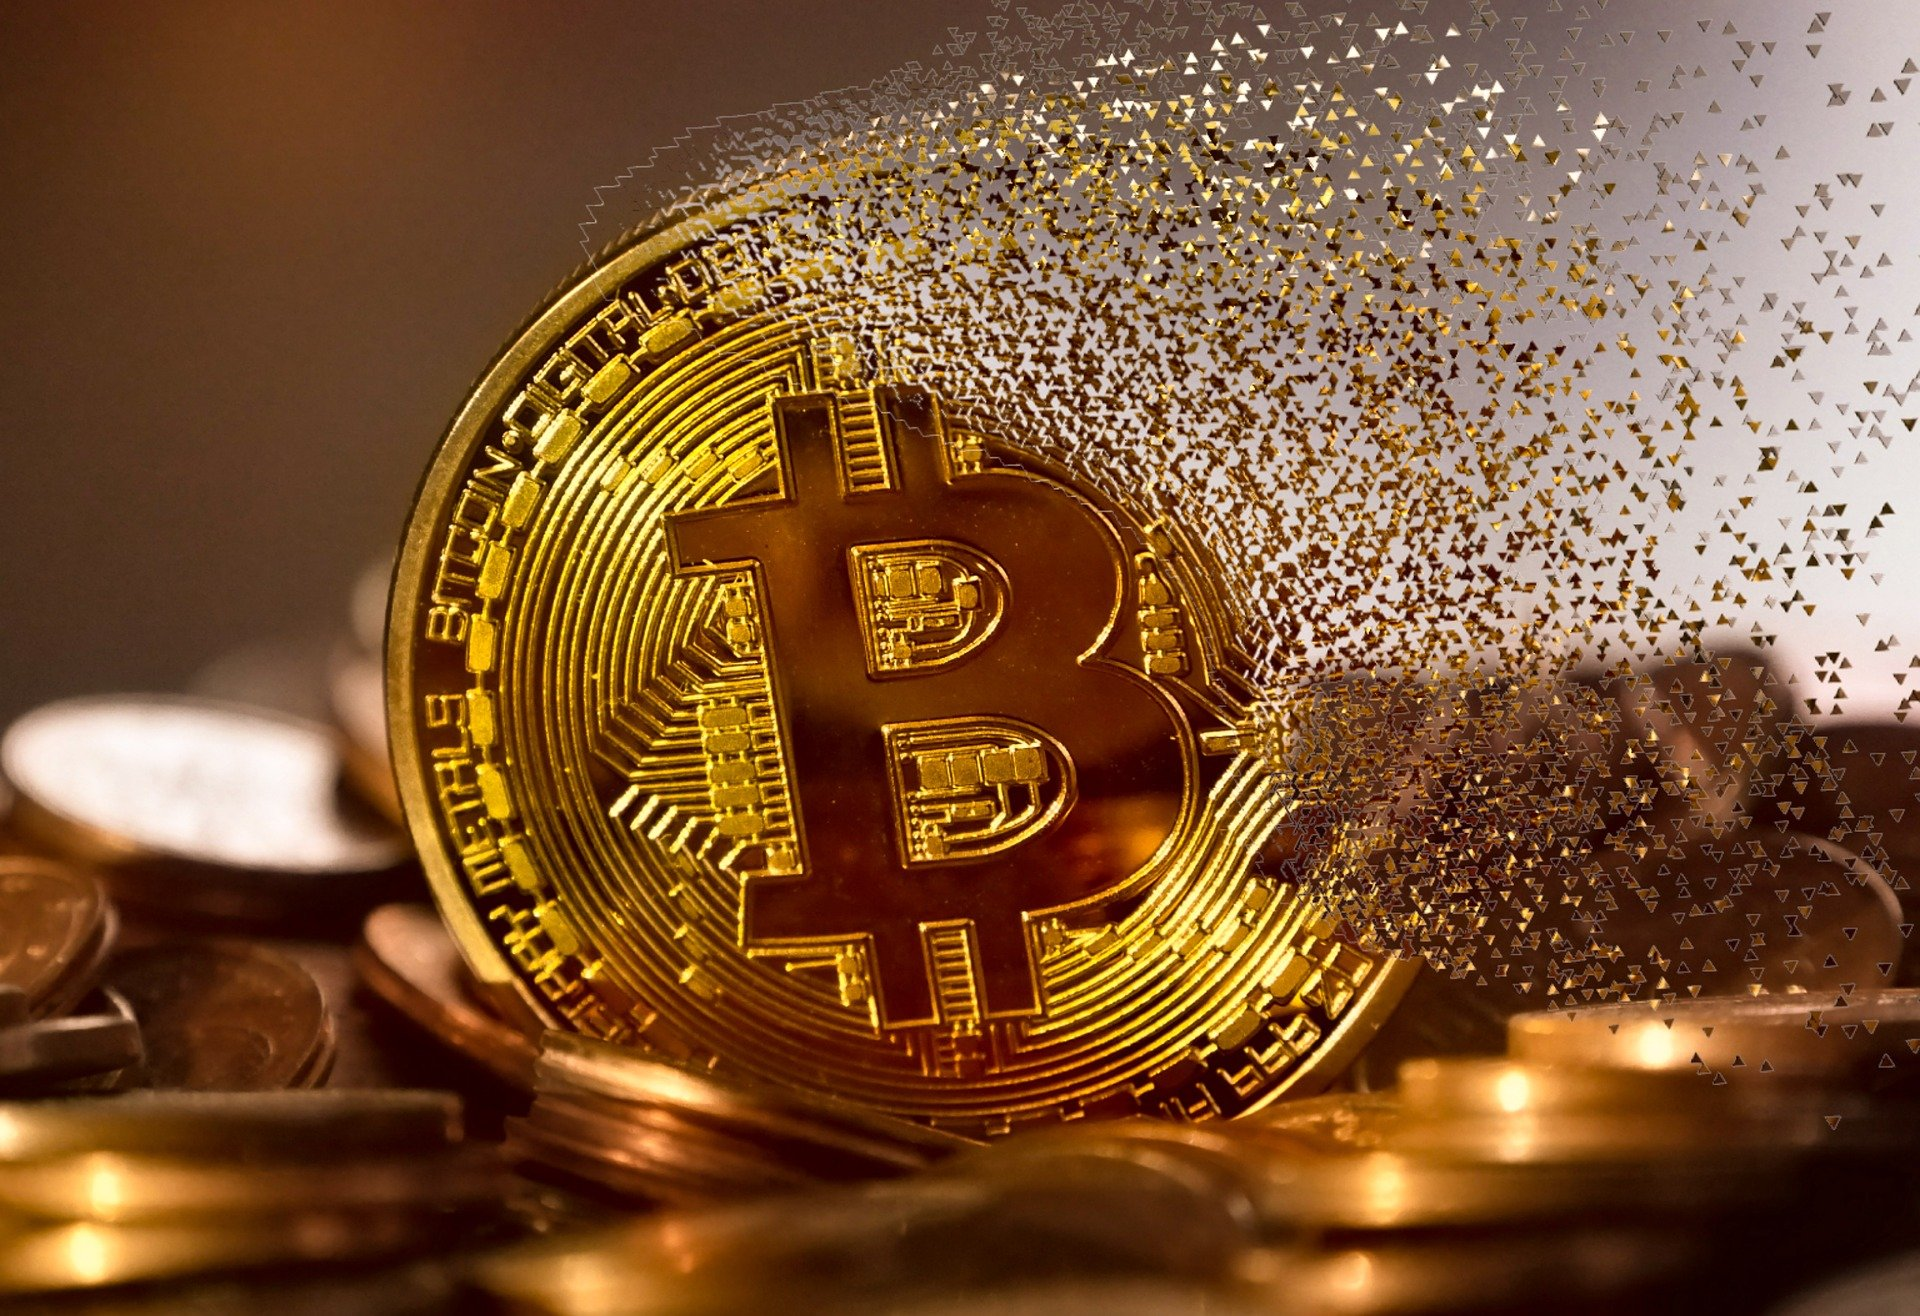 Bitcoin achieves historic high - passes $30,000 mark